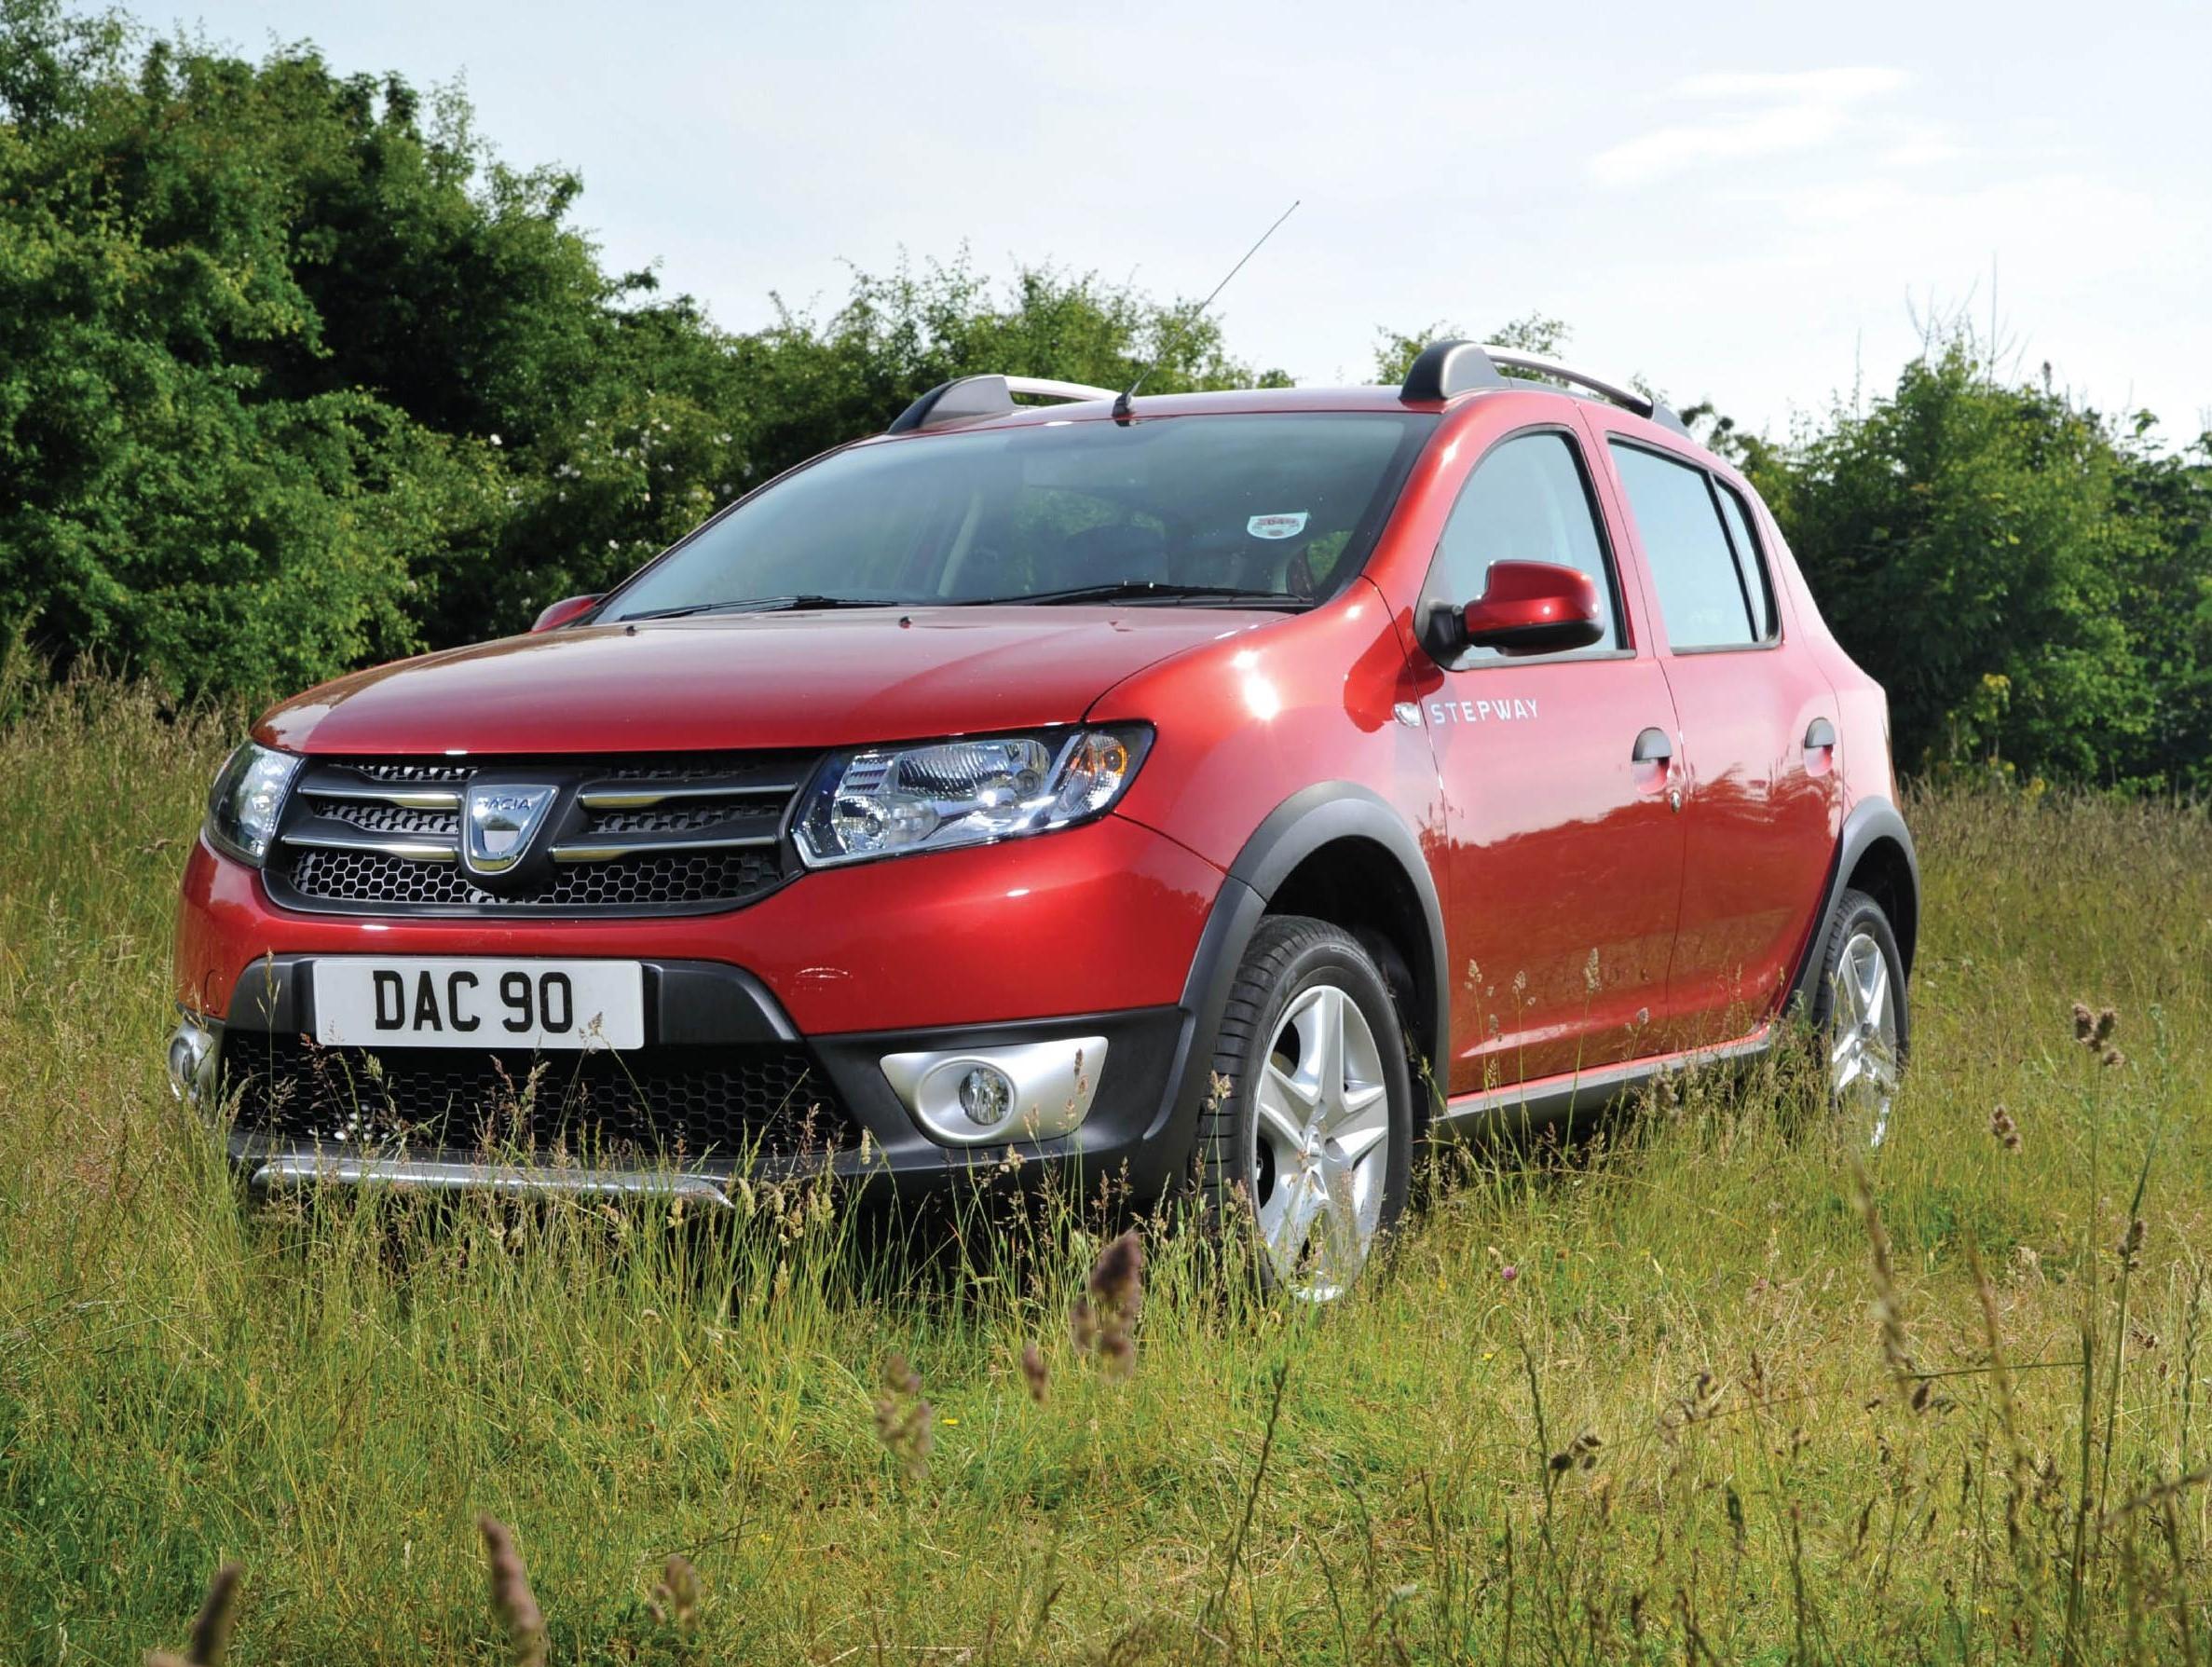 Dacia Sandero Stepway-Driving and Handling